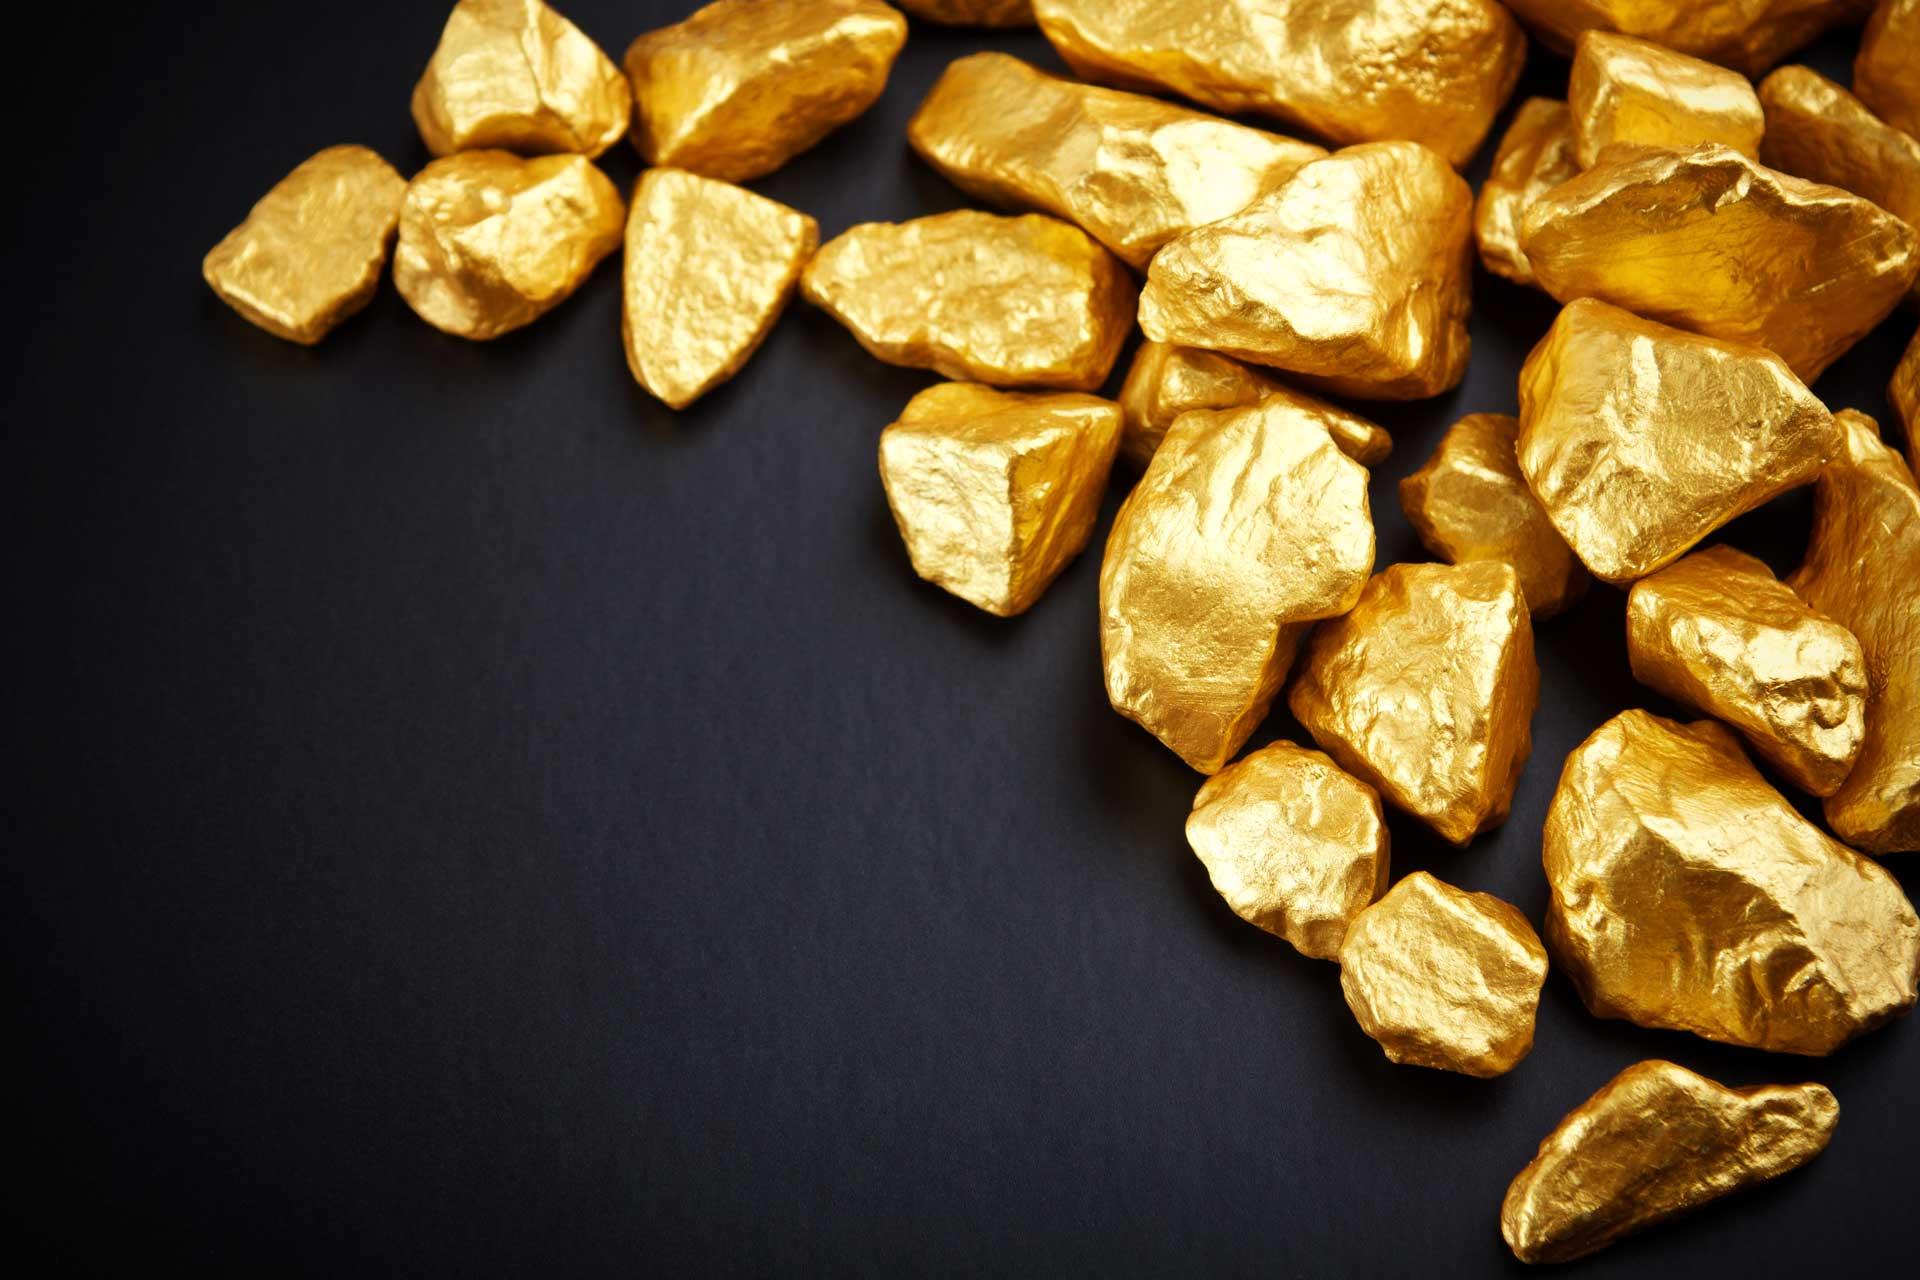 Gold Wave Analysis 28 September, 2020